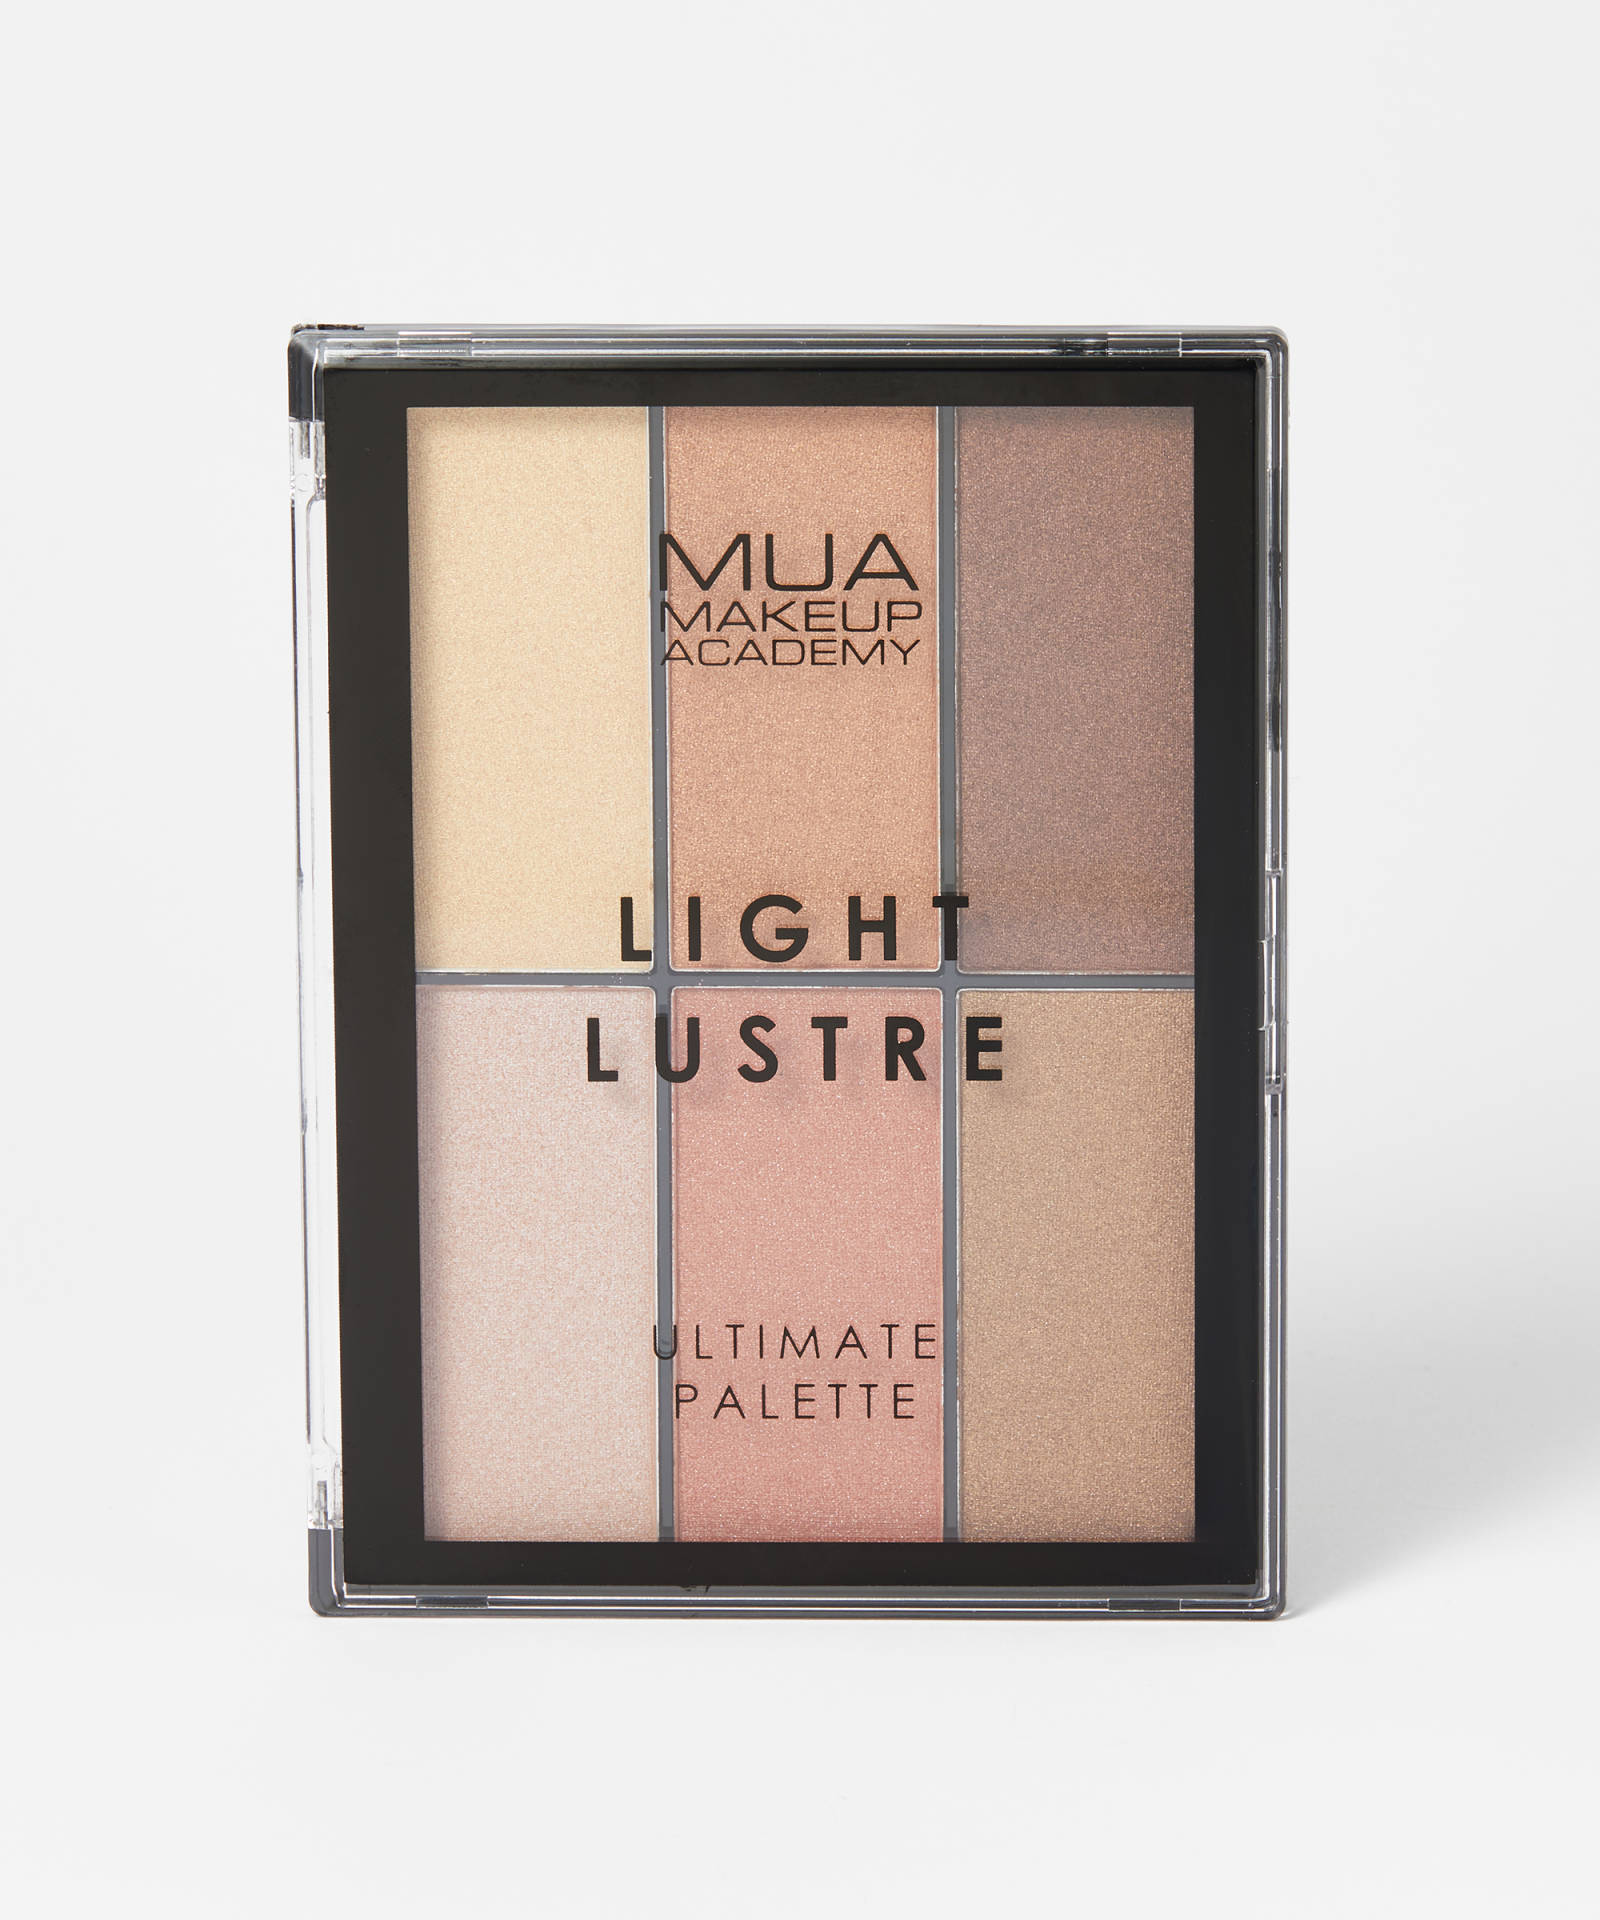 MUA Light Lustre Ultimate Palette